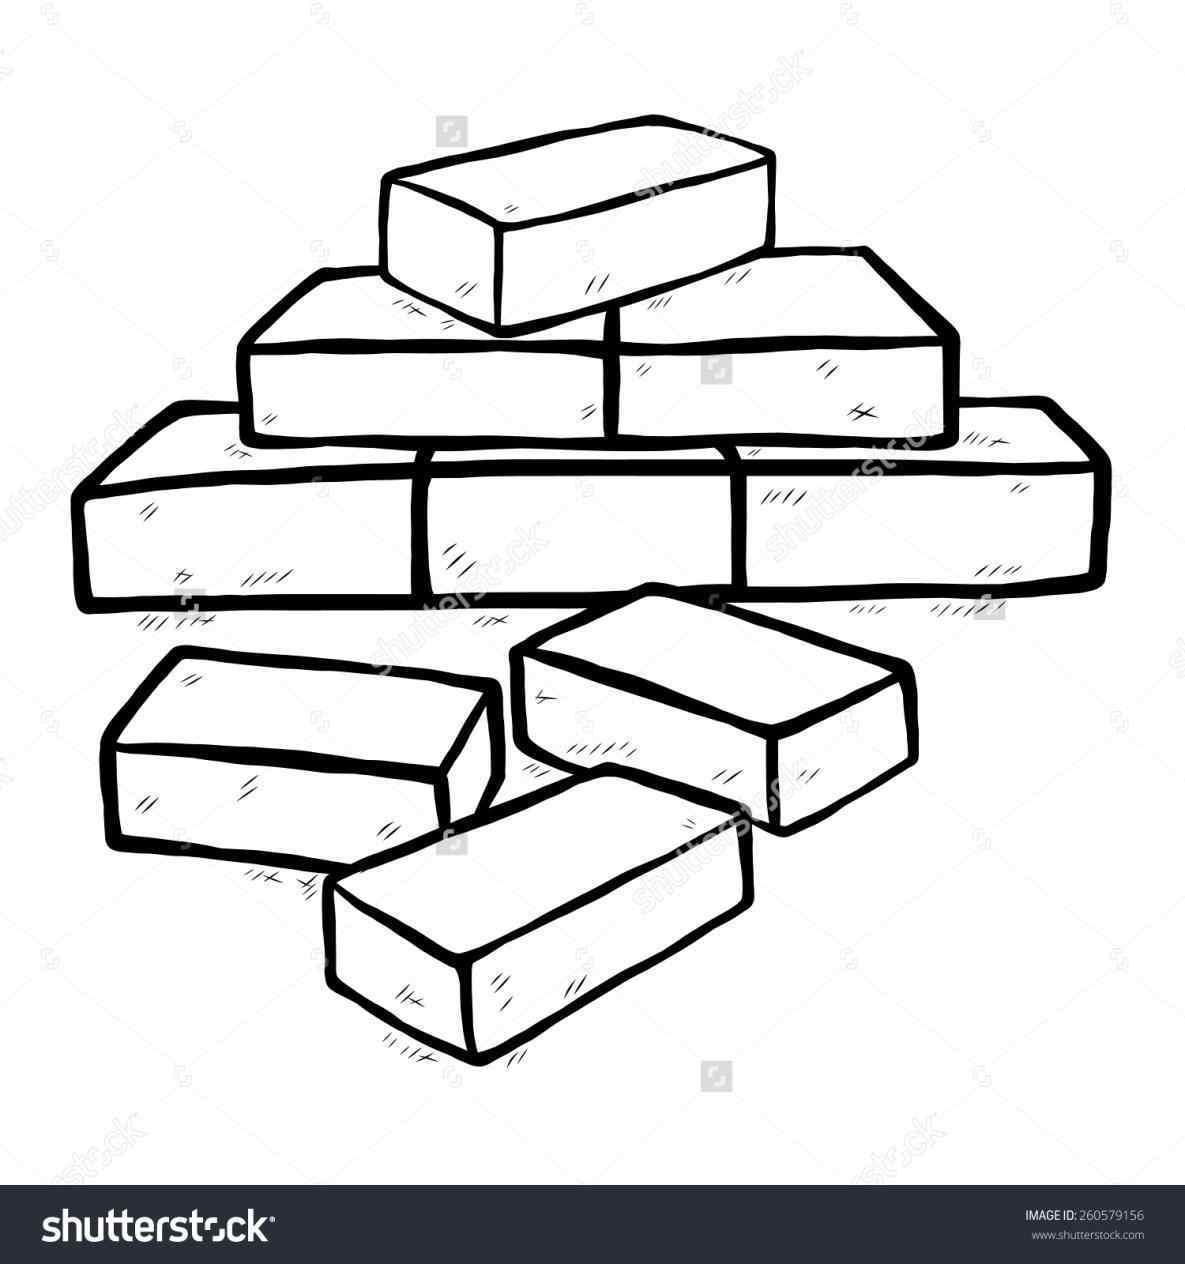 Bricks clipground clip art. Brick clipart black and white